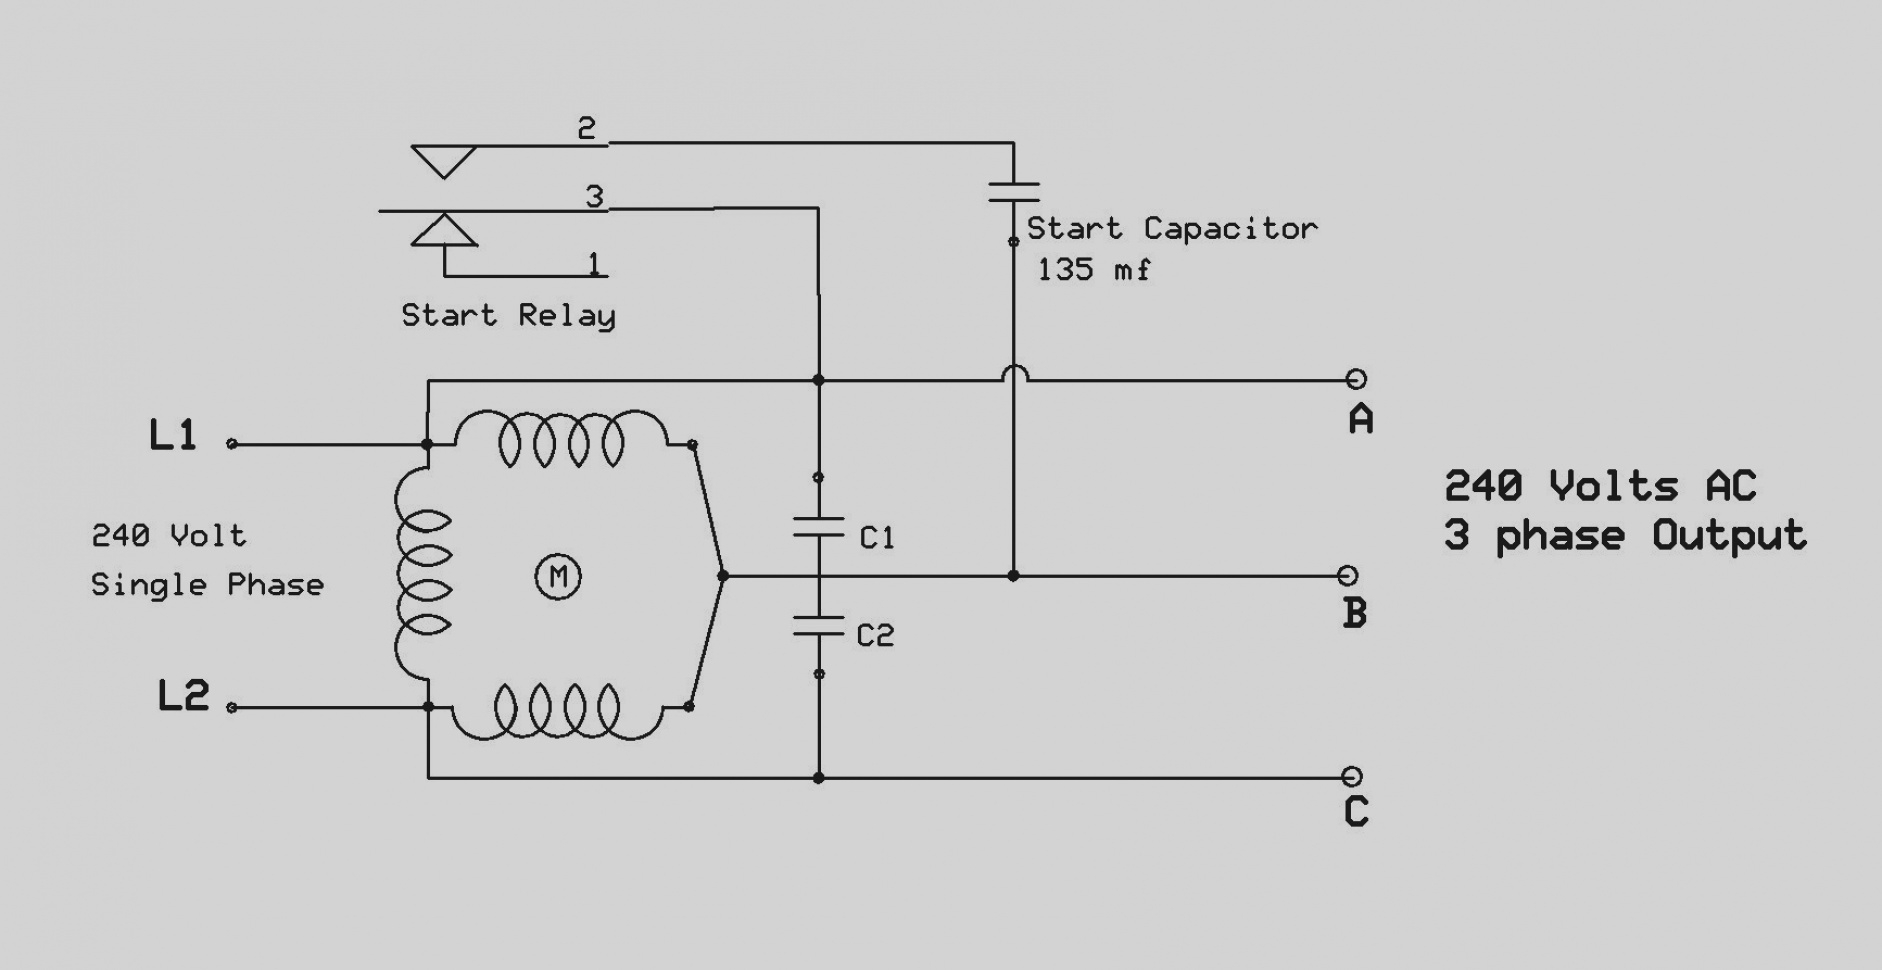 hight resolution of baldor 1 5 hp wiring diagram download baldor 1 5 hp wiring diagram wiring diagrams 2